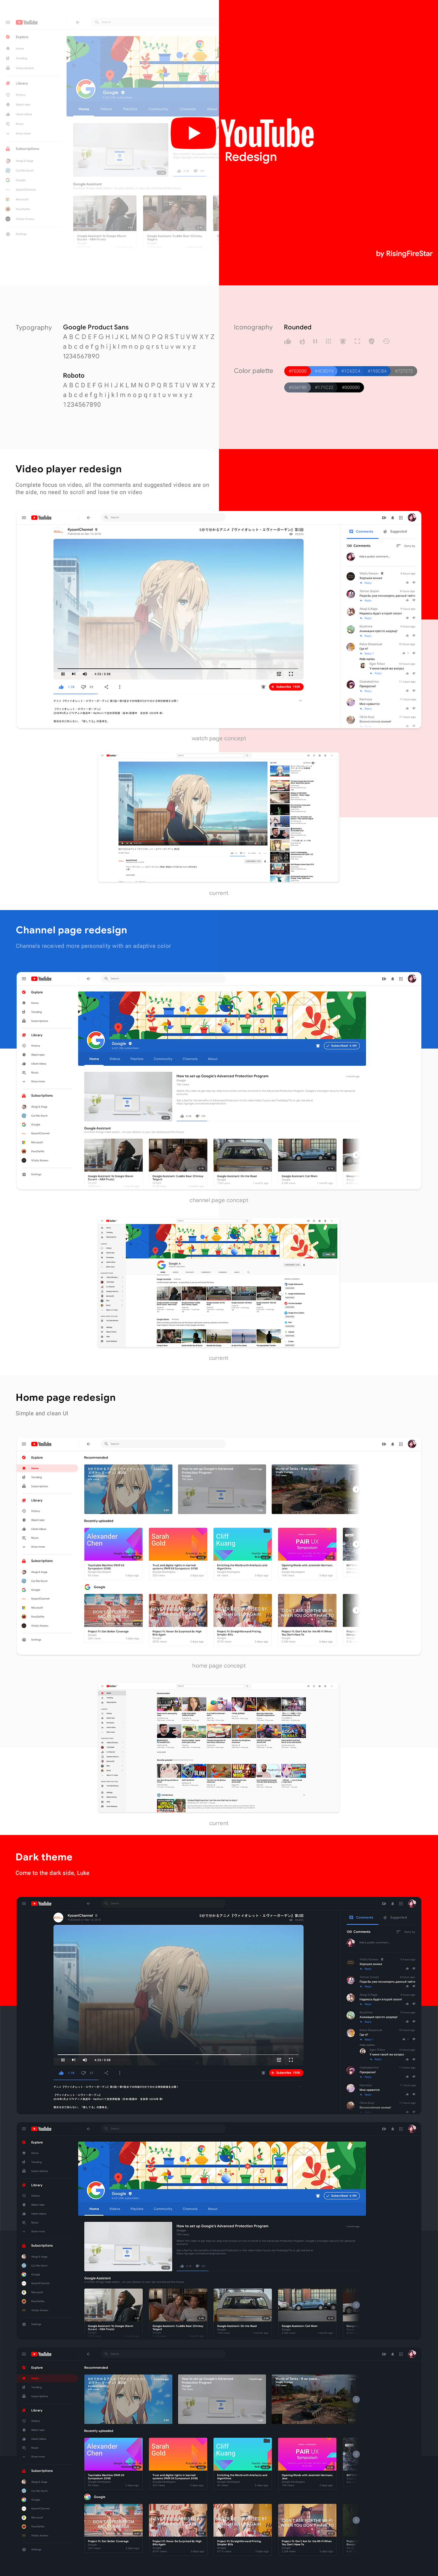 youtube redesign material design UI ux material design